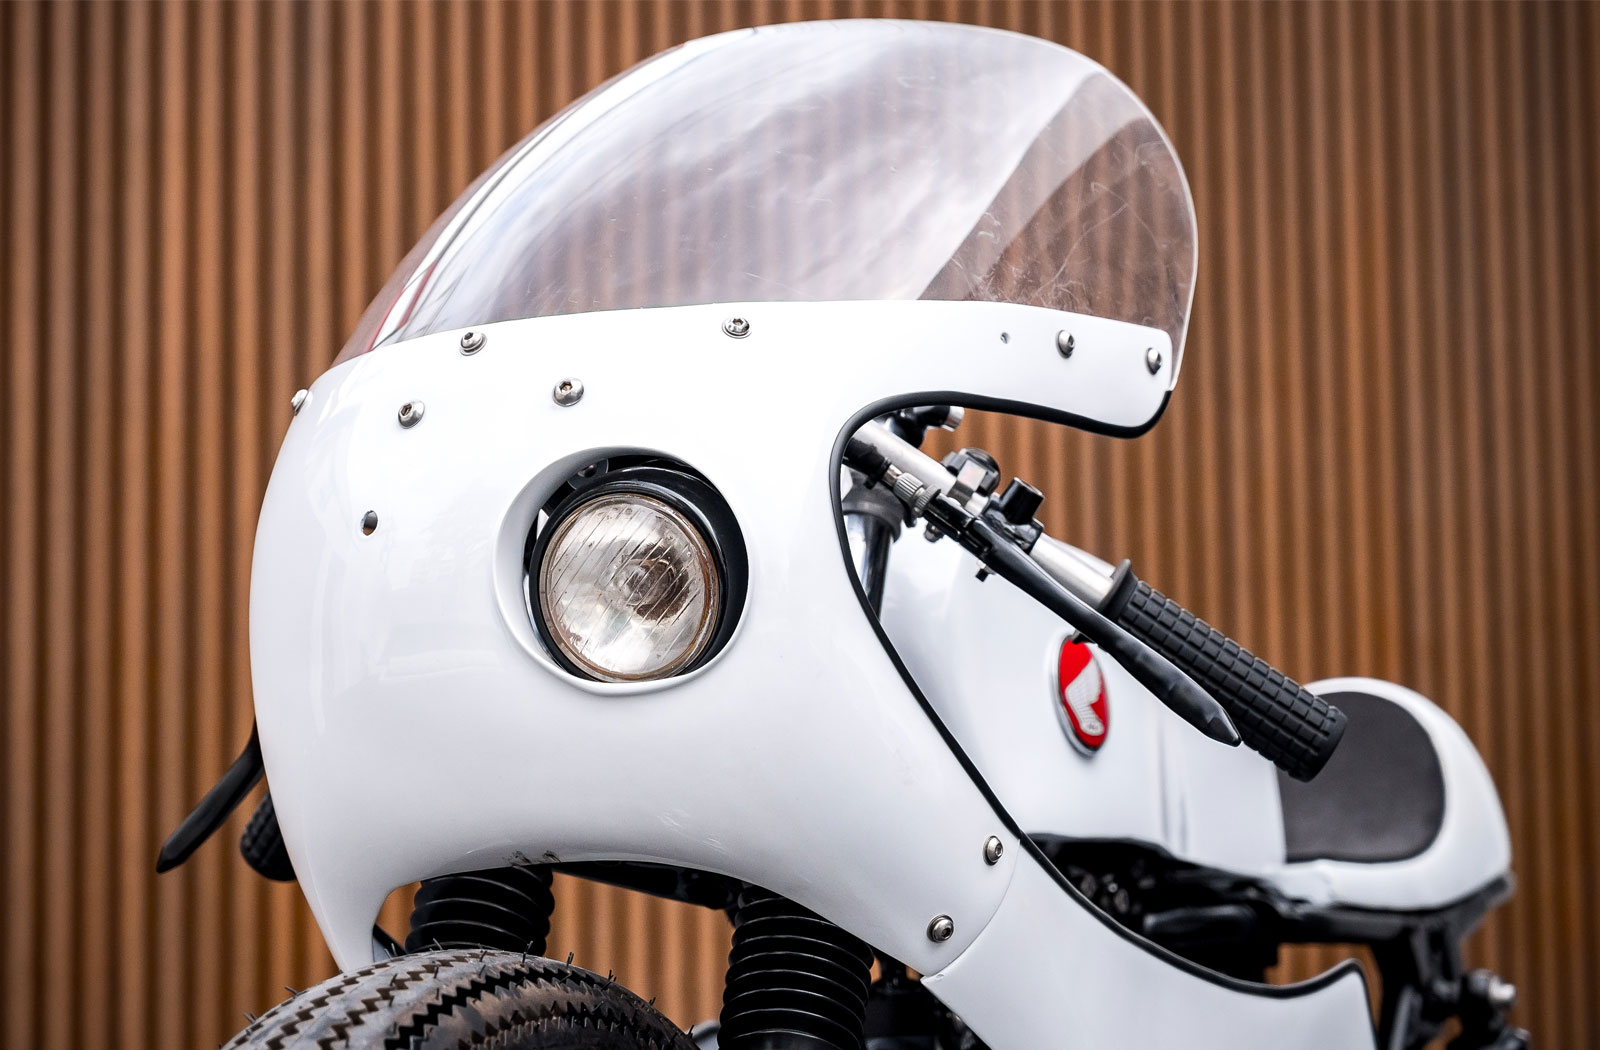 K-Speed Honda 125 vintage racer